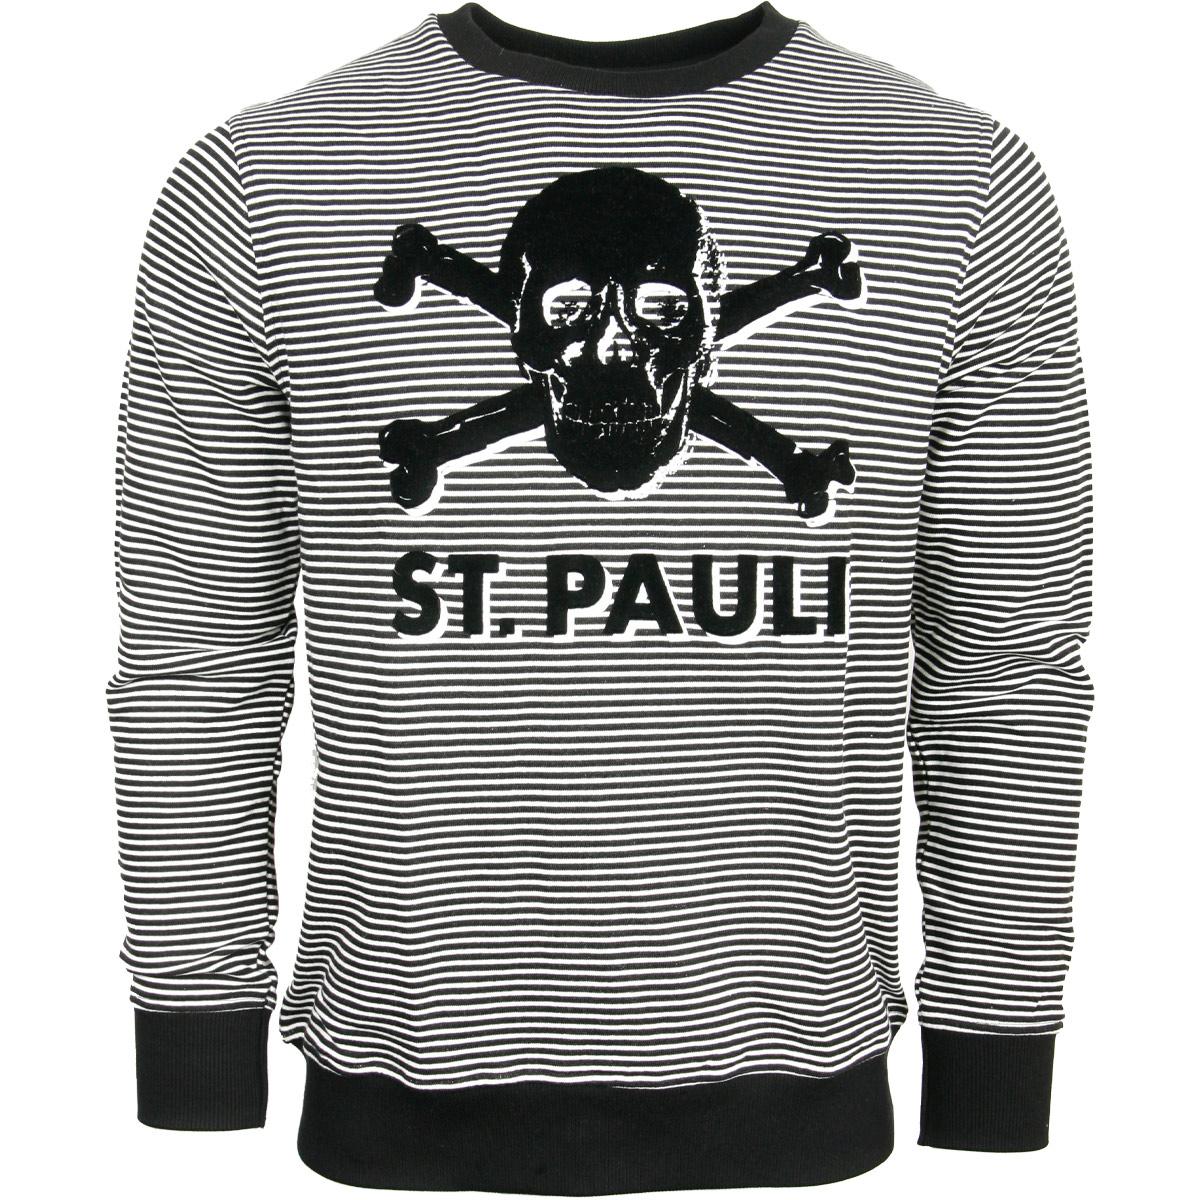 FC St. Pauli - Sweatshirt Stripe Terry Totenkopf - schwarz-weiß